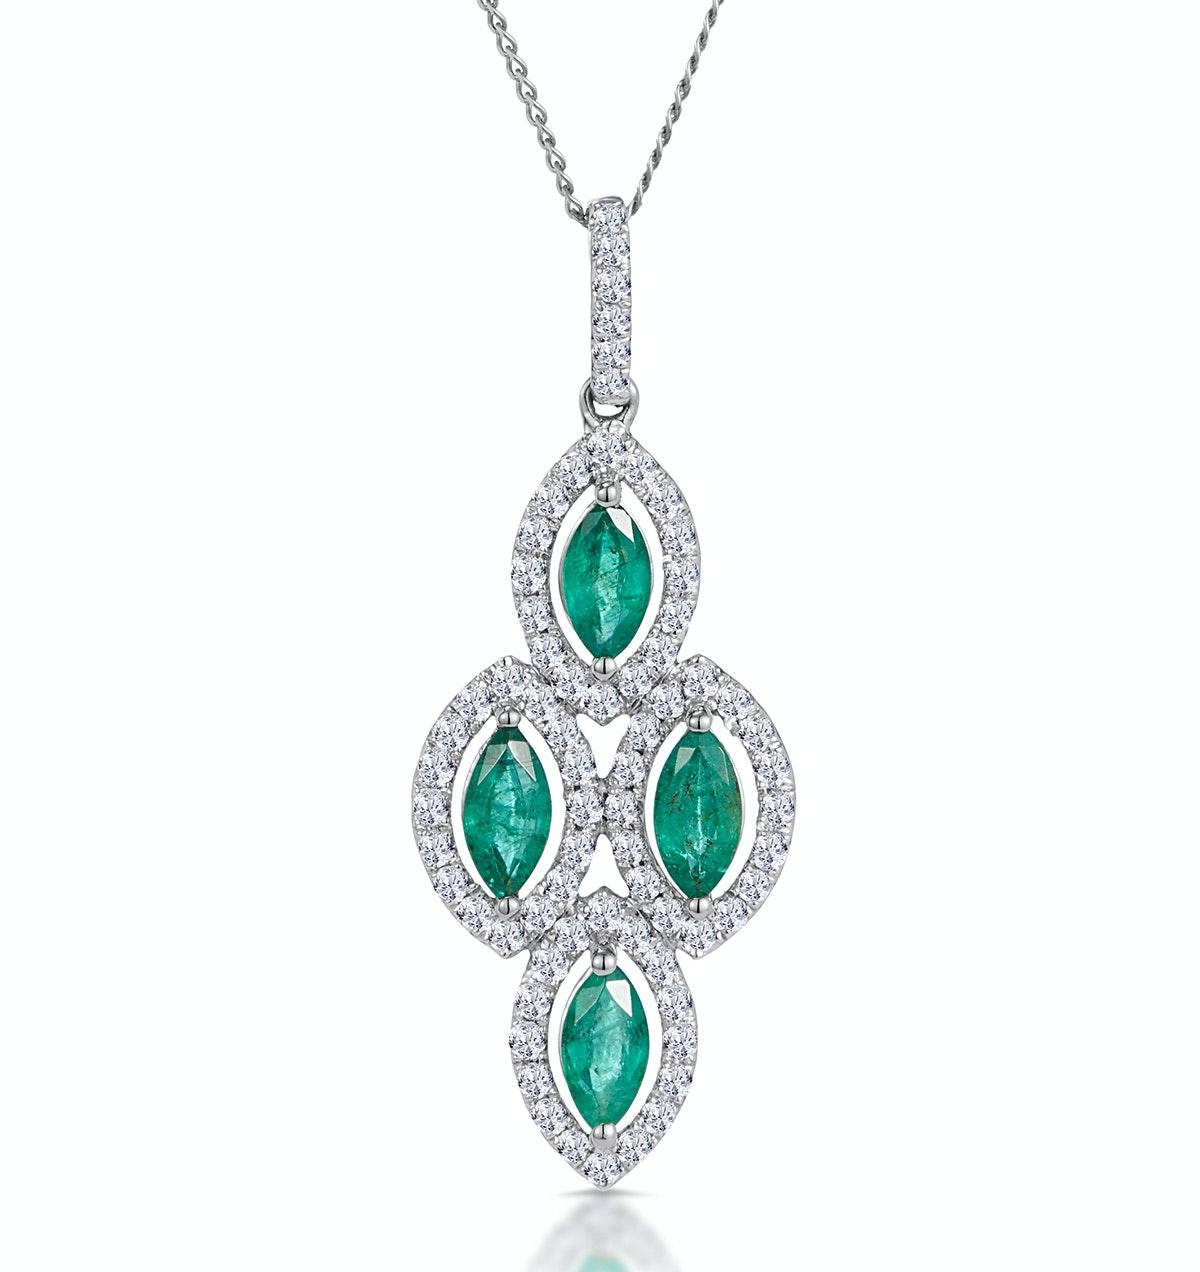 1ct Emerald Asteria Collection Diamond Drop Pendant in 18K White Gold